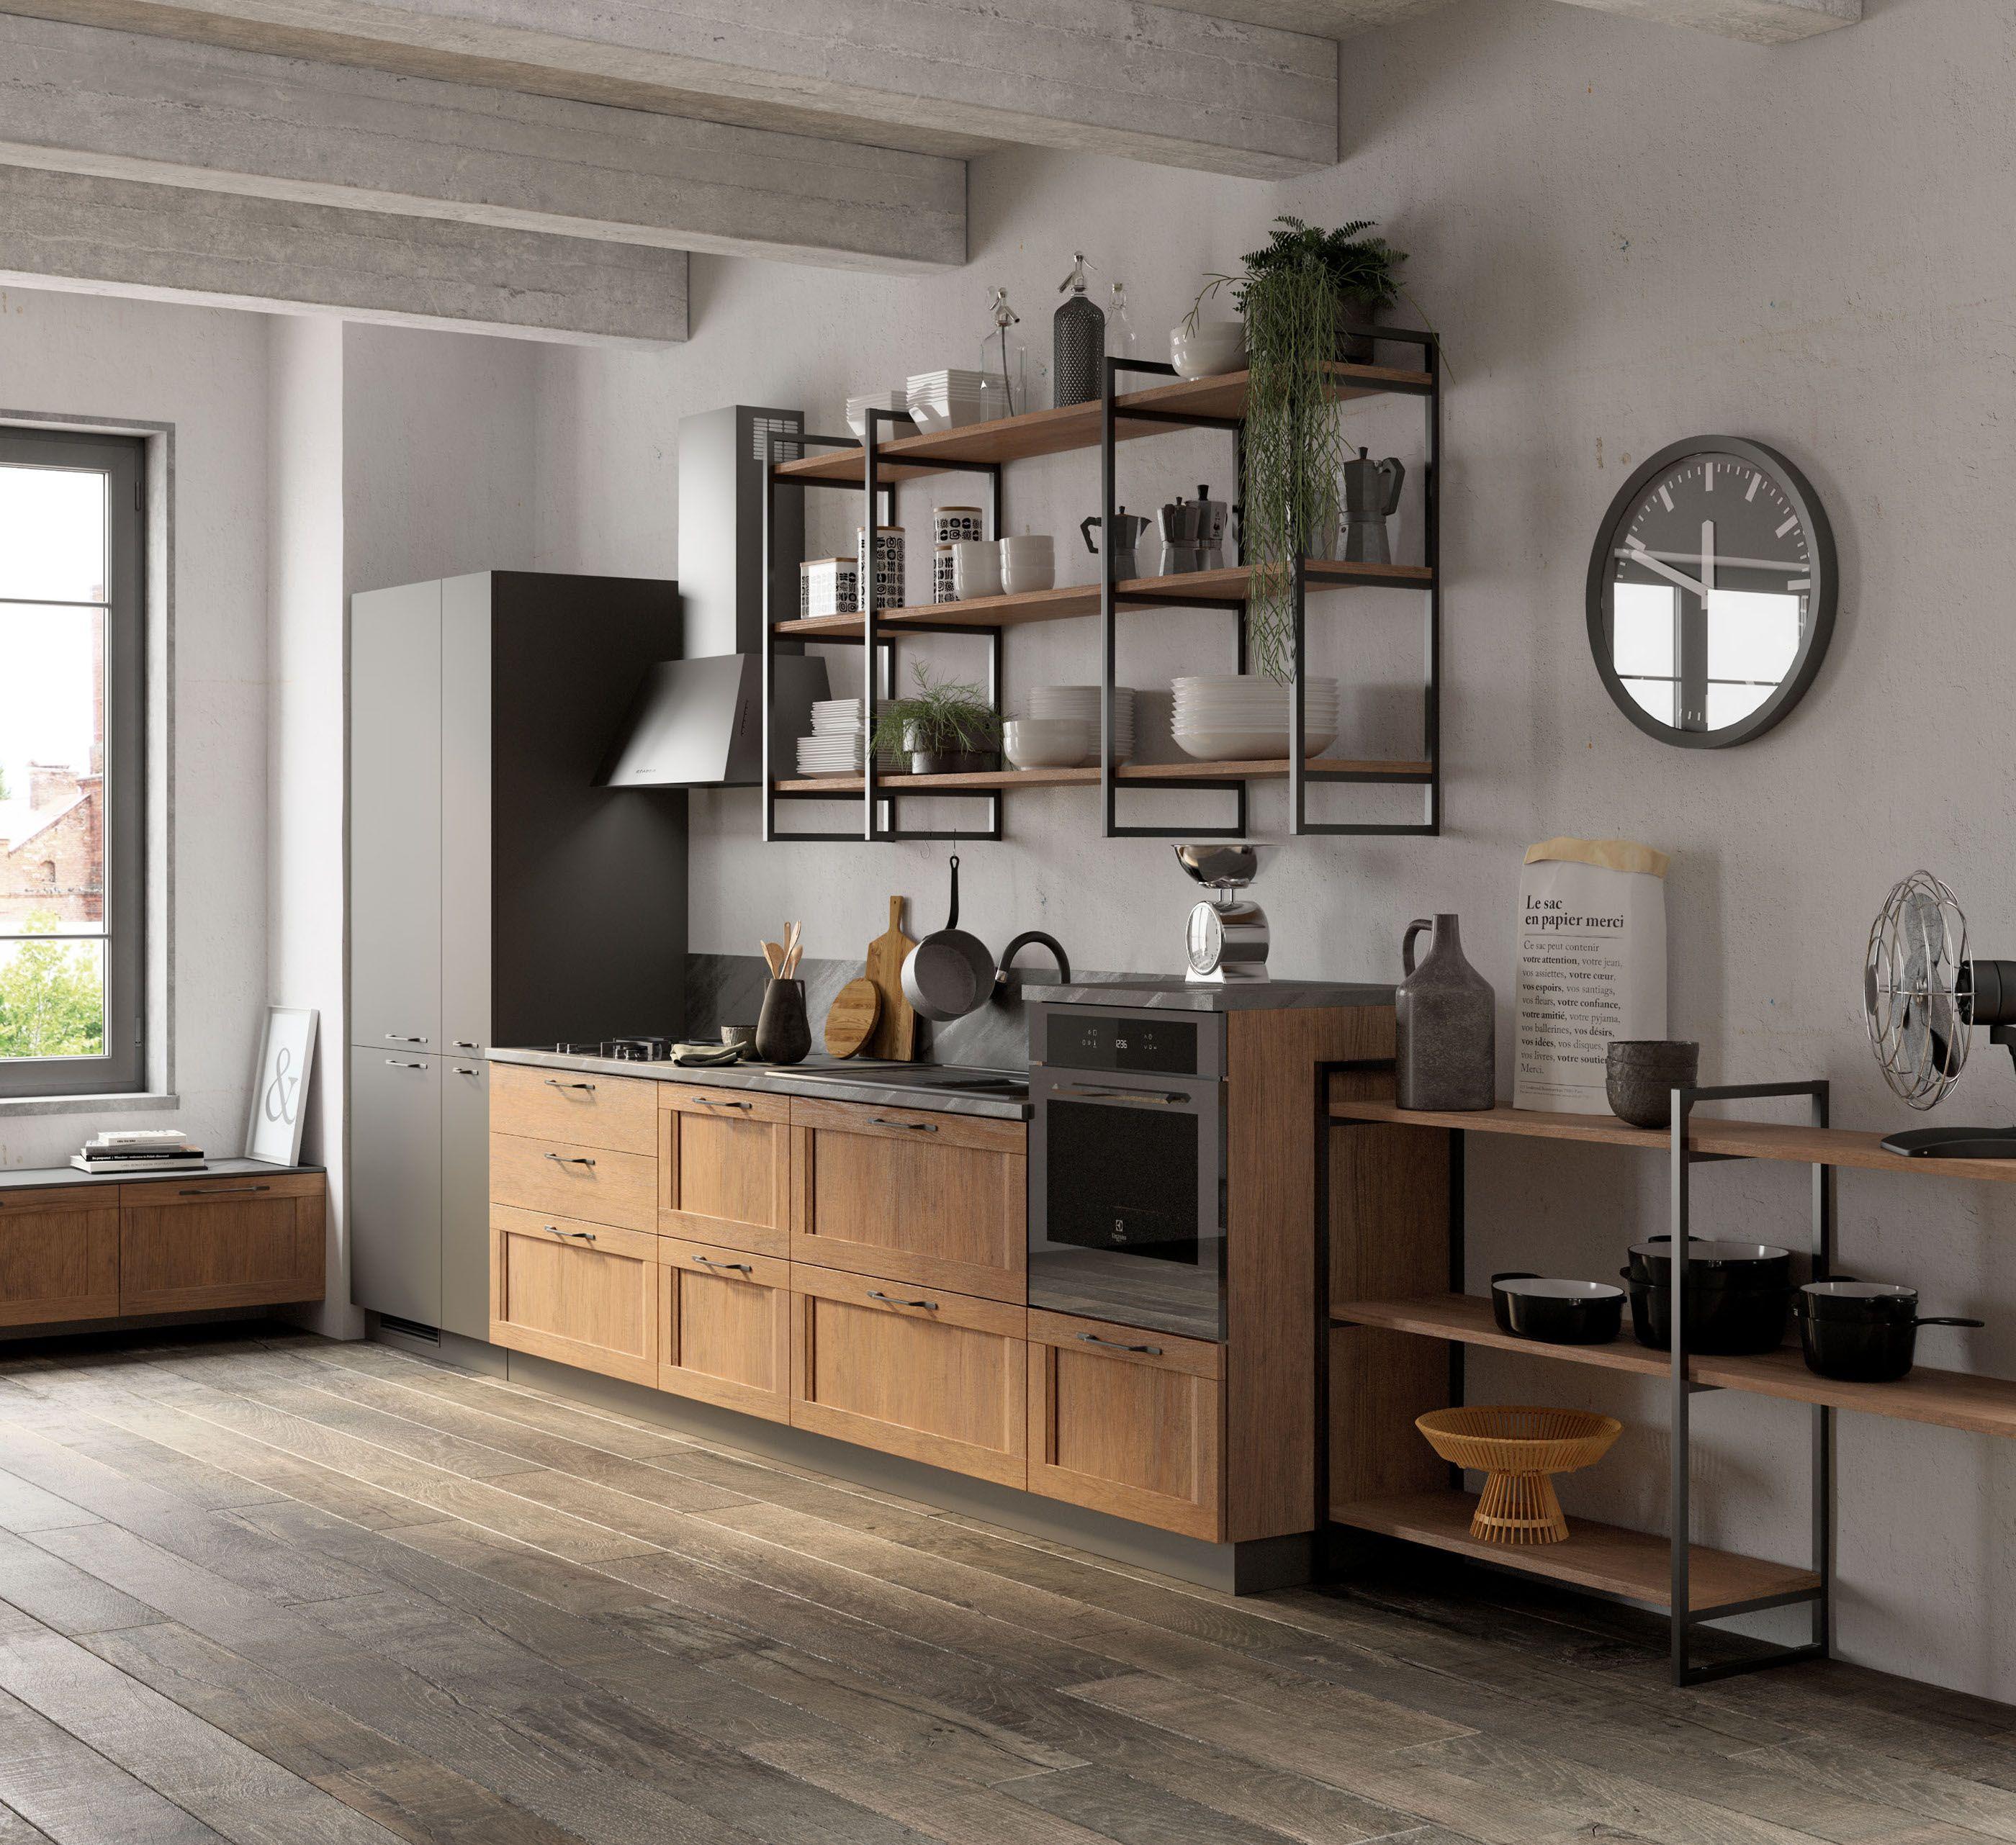 D'life home interiors ernakulam kerala  kitchen on behance  cuisines aménagés  pinterest  behance